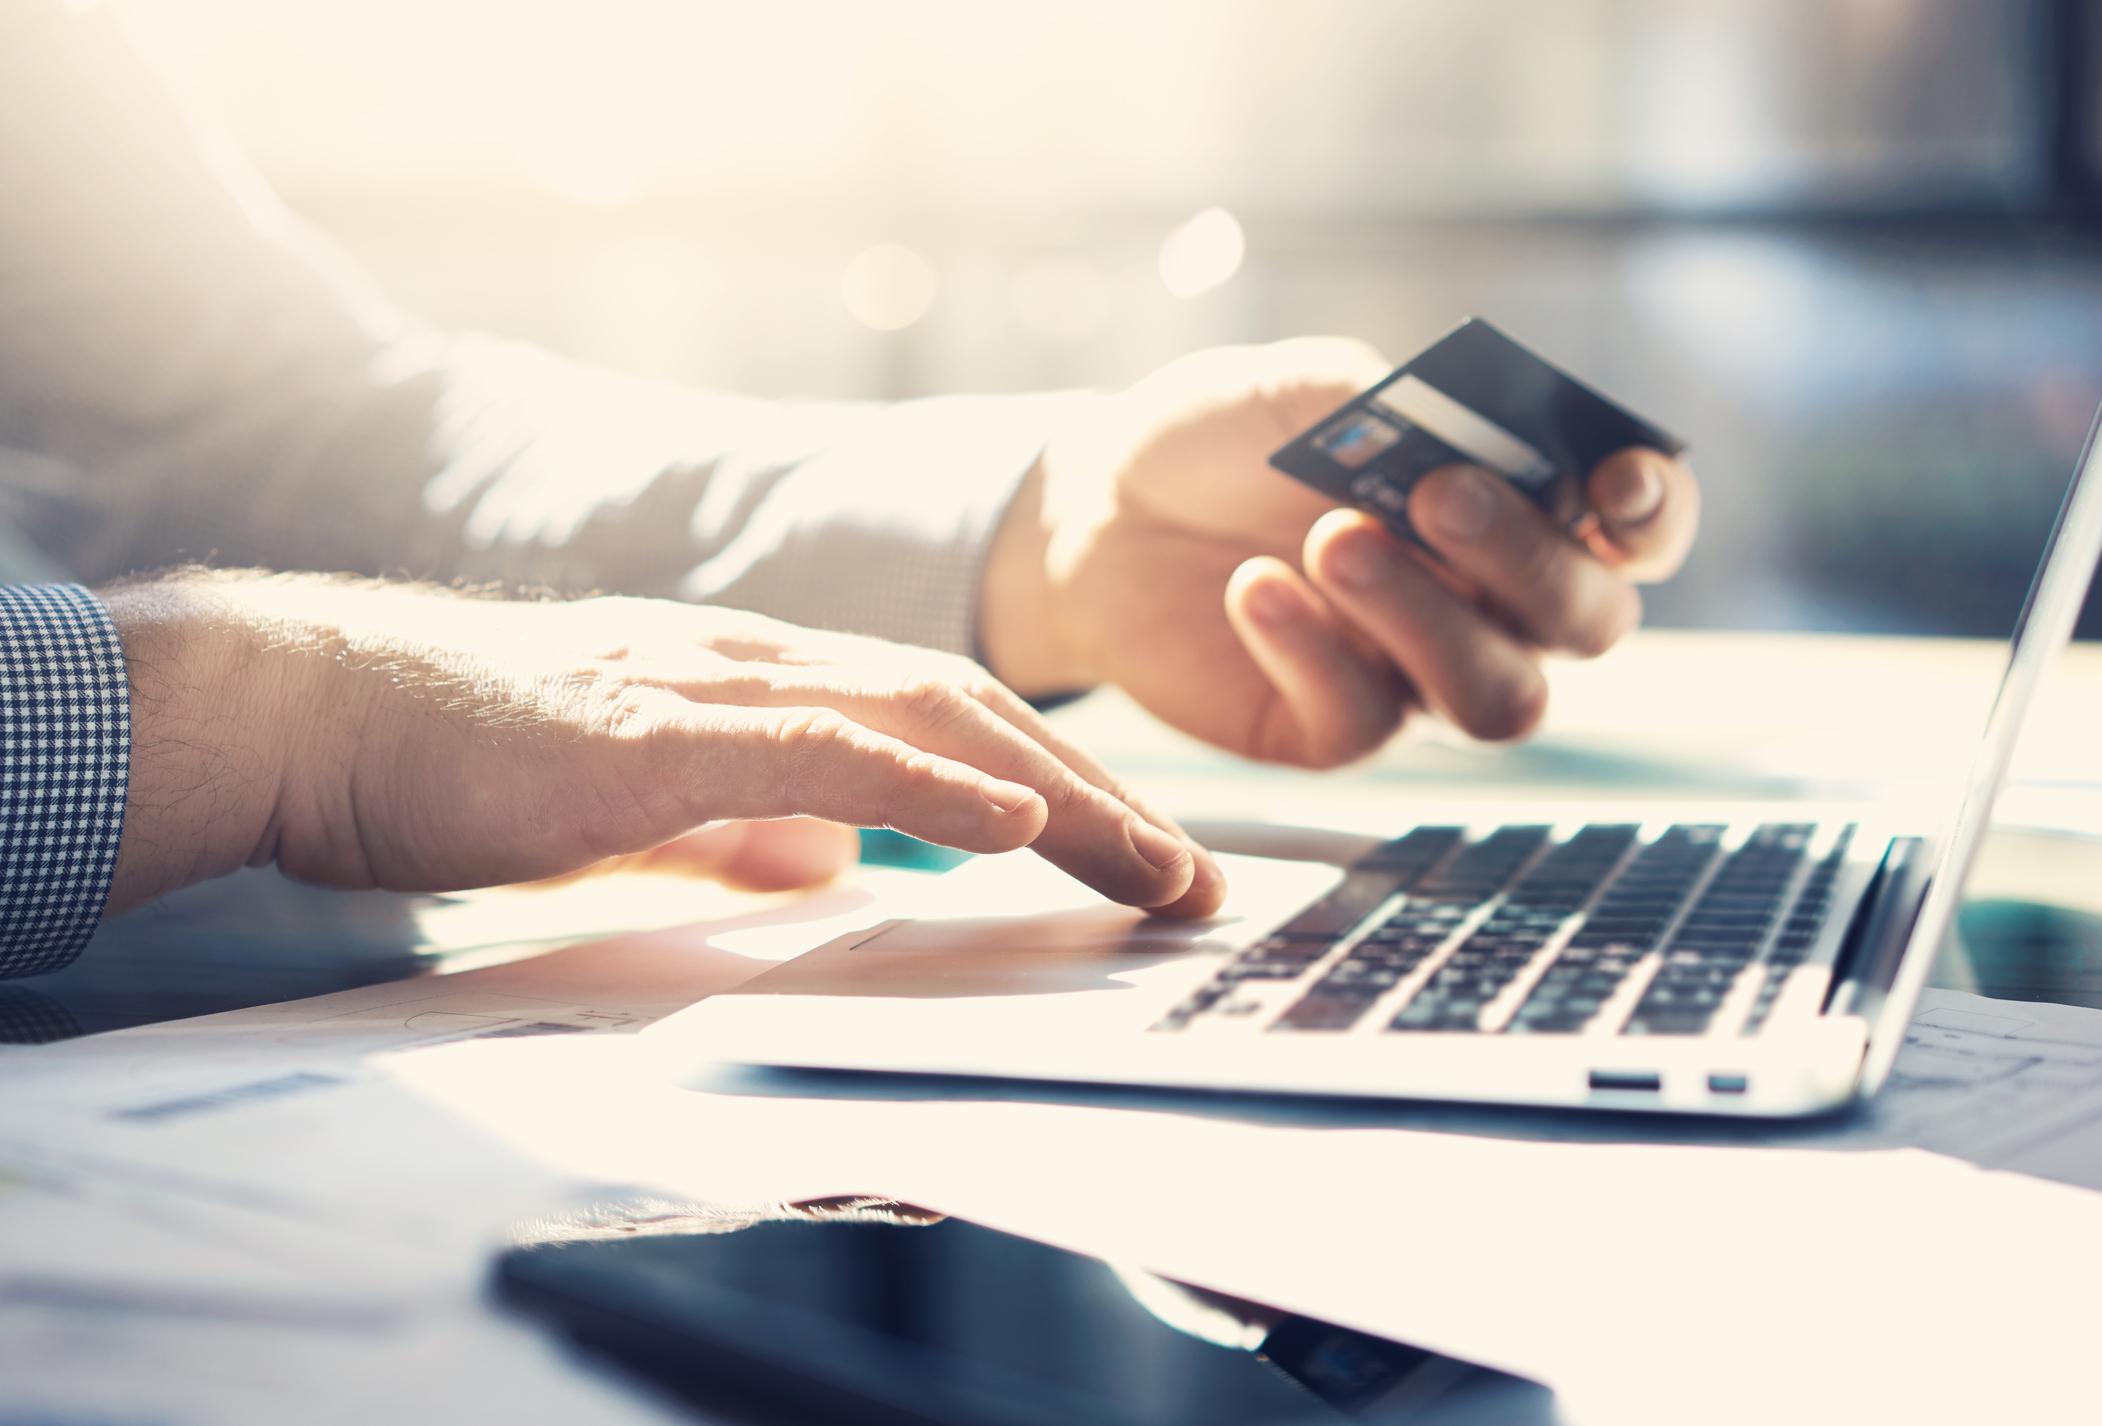 A customer enters credit card information online.